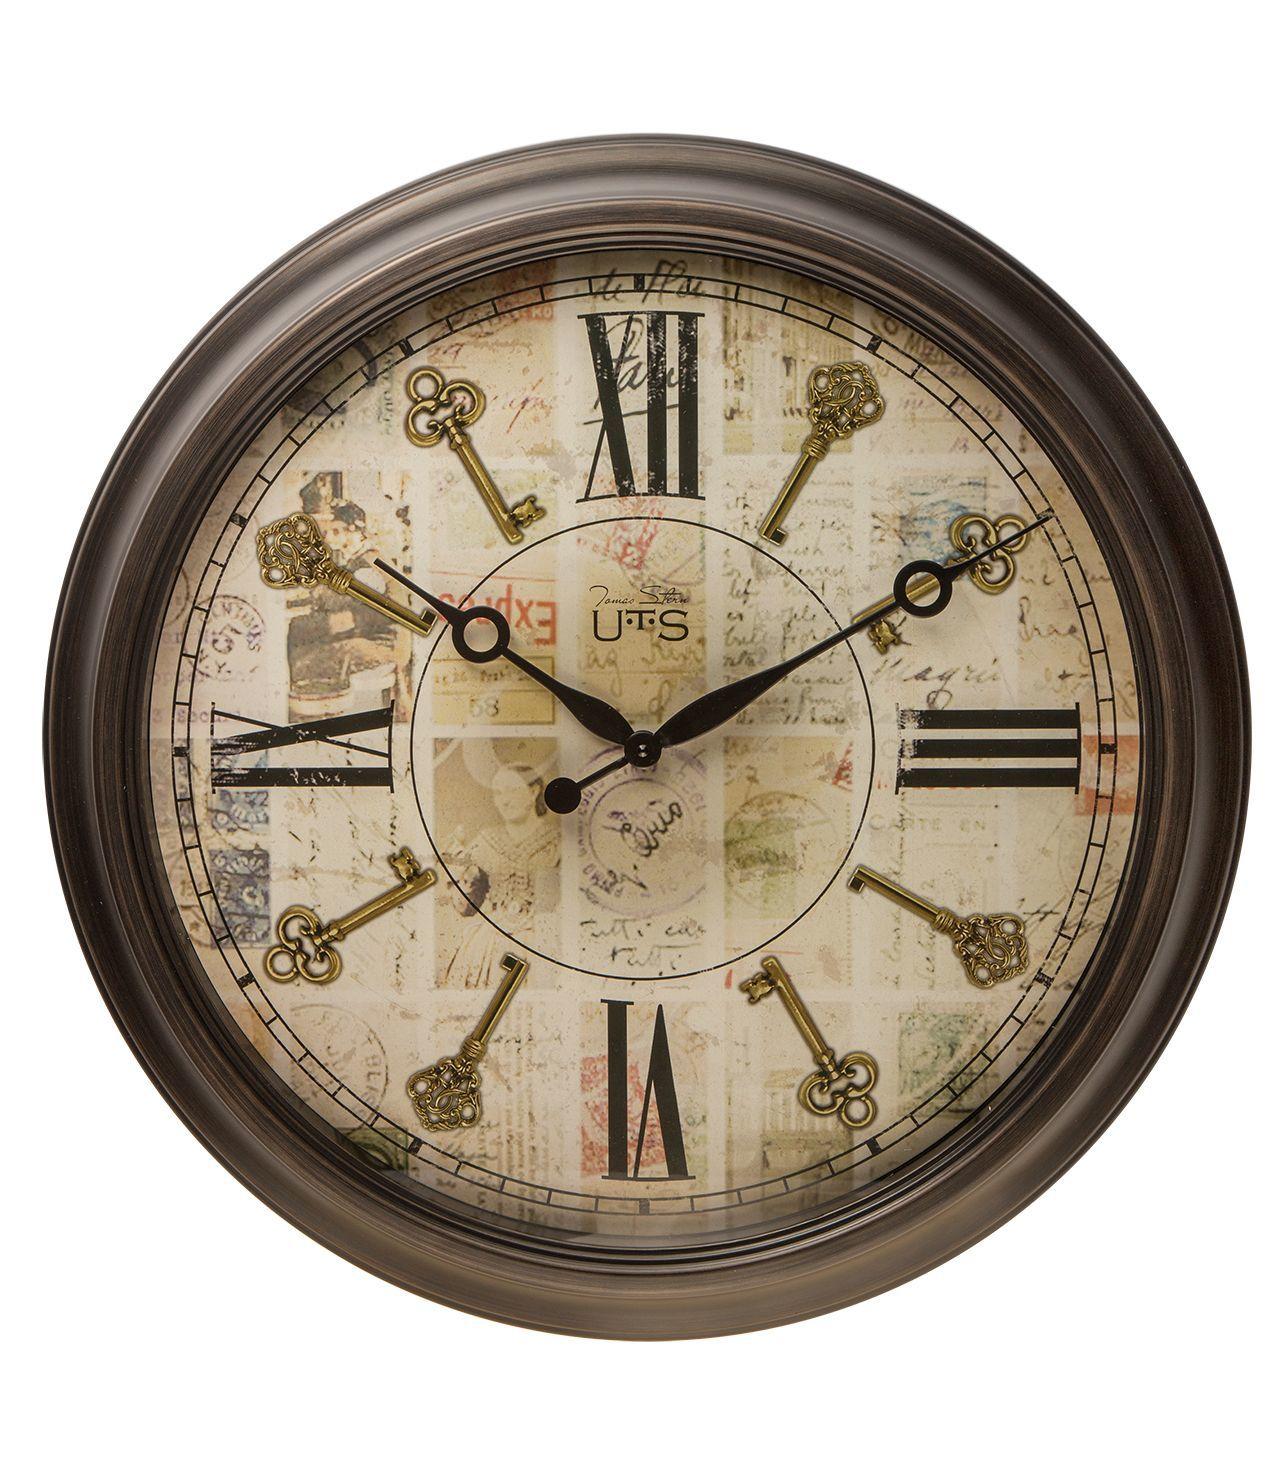 Часы настенные Часы настенные Tomas Stern 9018 chasy-nastennye-tomas-stern-9018-germaniya.jpg